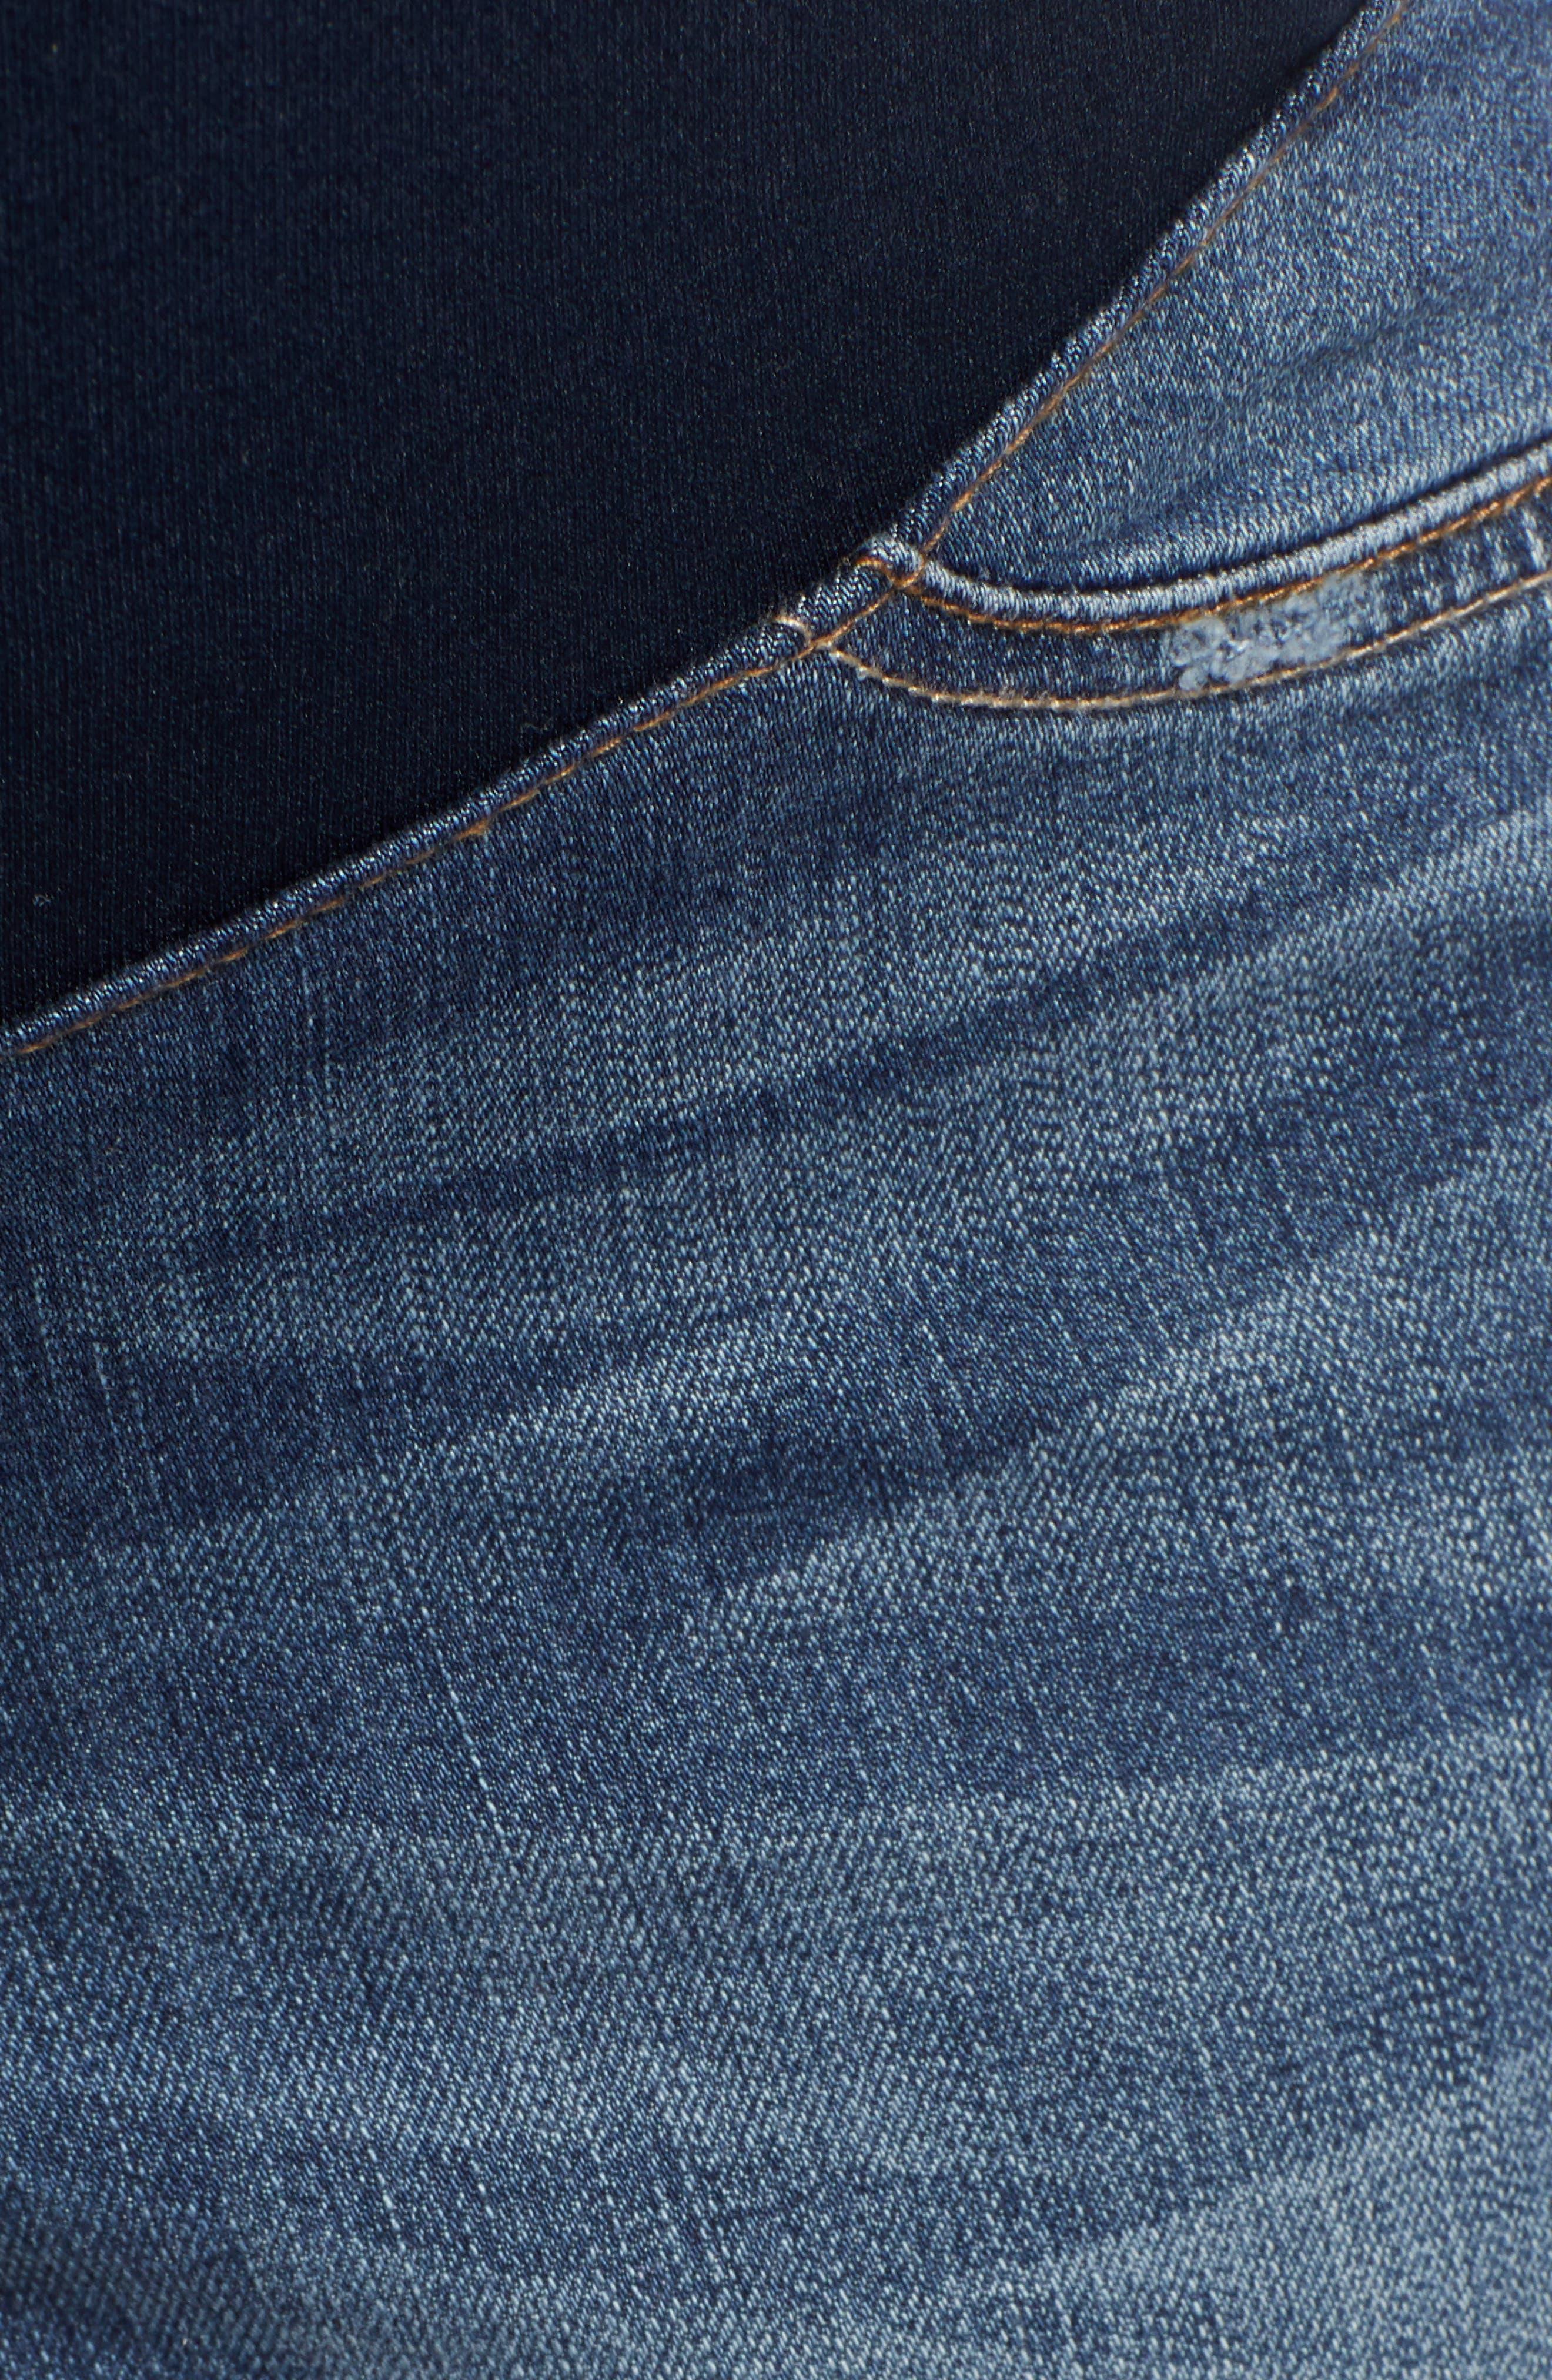 Cassie Crop Straight Leg Maternity Jeans,                             Alternate thumbnail 5, color,                             CASSIE